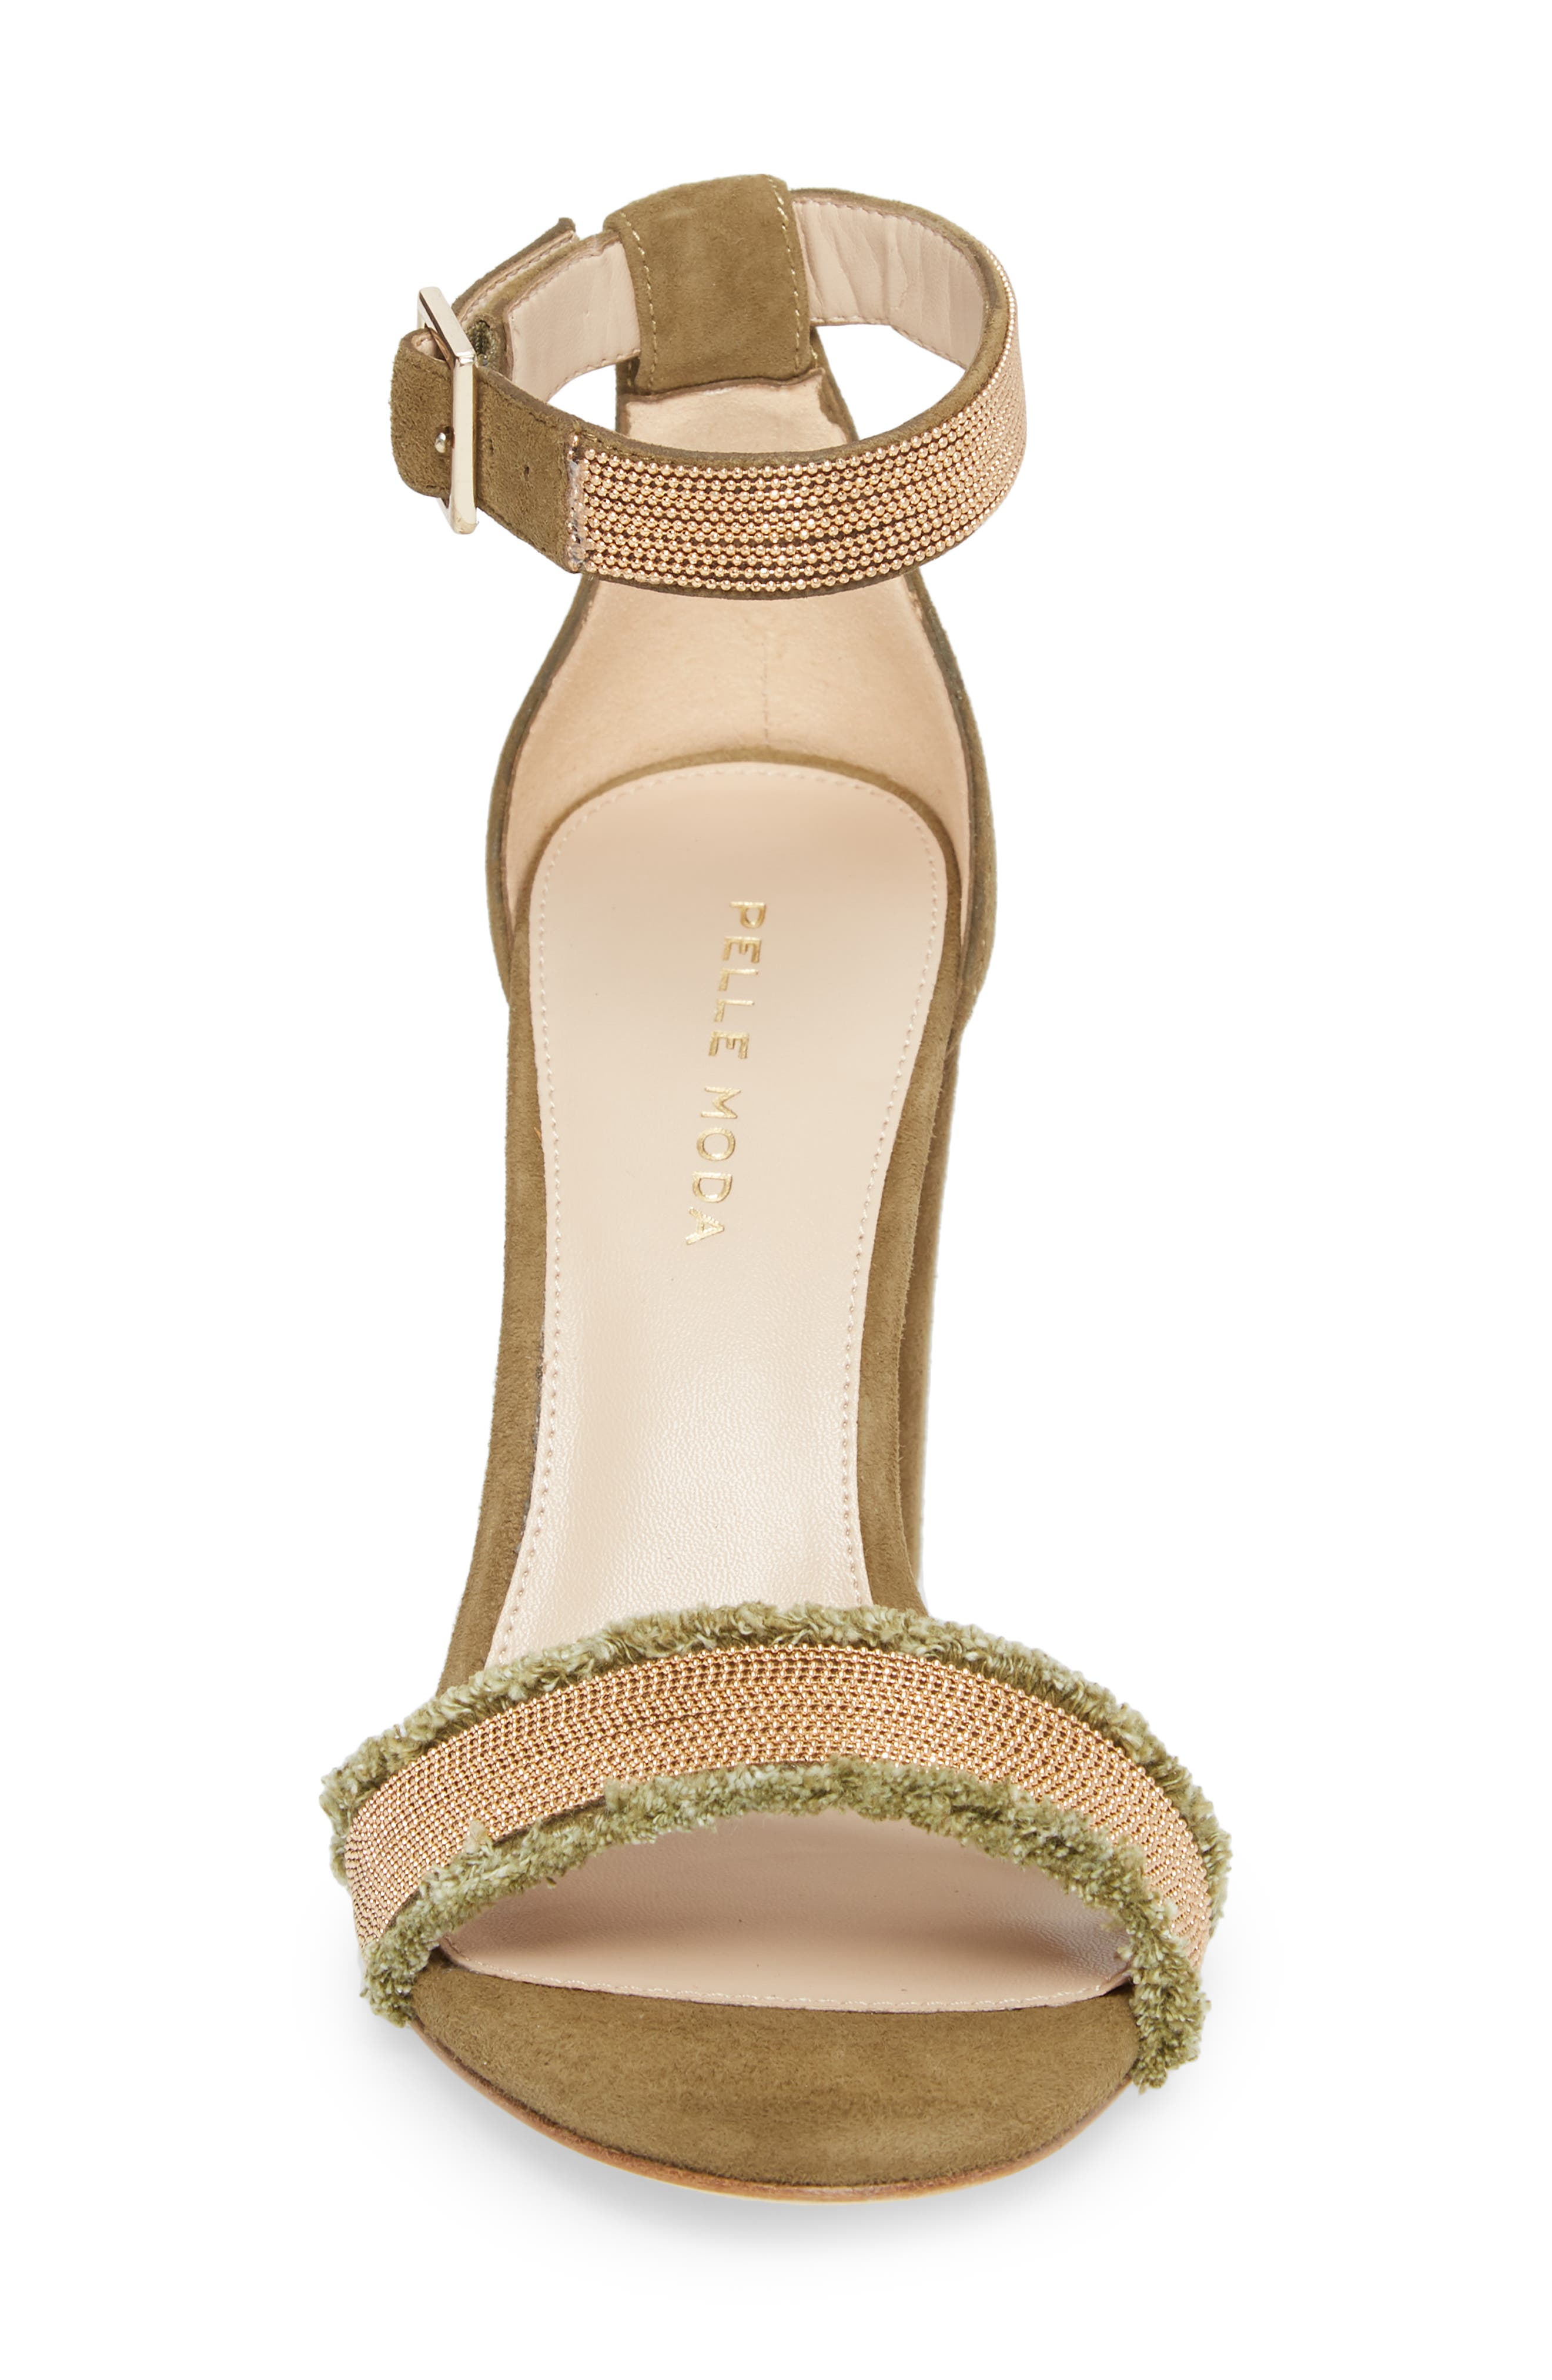 Bonnie6 Embellished Sandal,                             Alternate thumbnail 4, color,                             KHAKI SUEDE